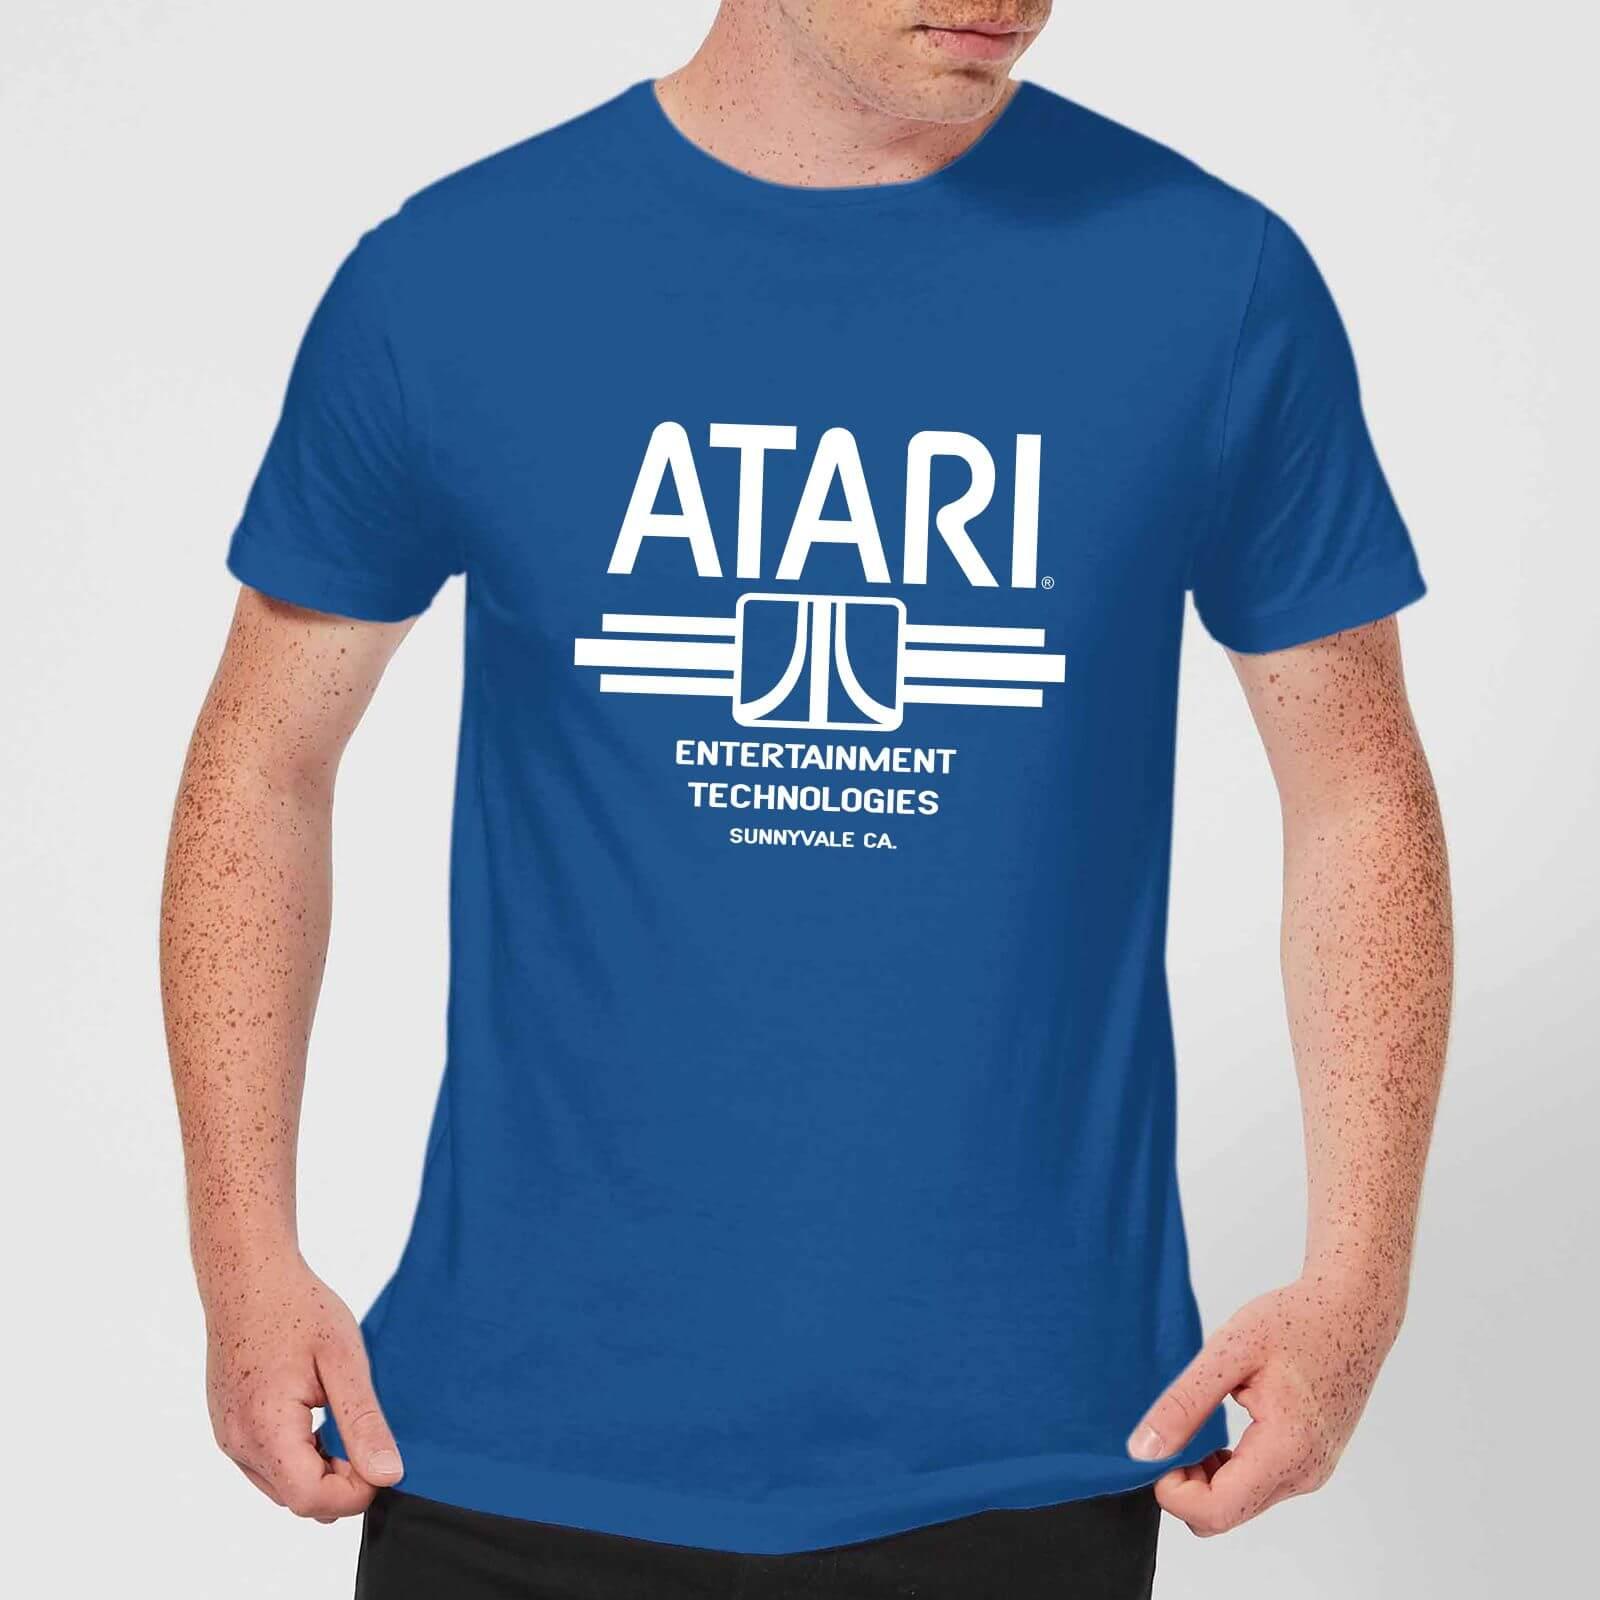 Atari Ent Tech Men's T-Shirt - Royal Blue - S - Royal Blue